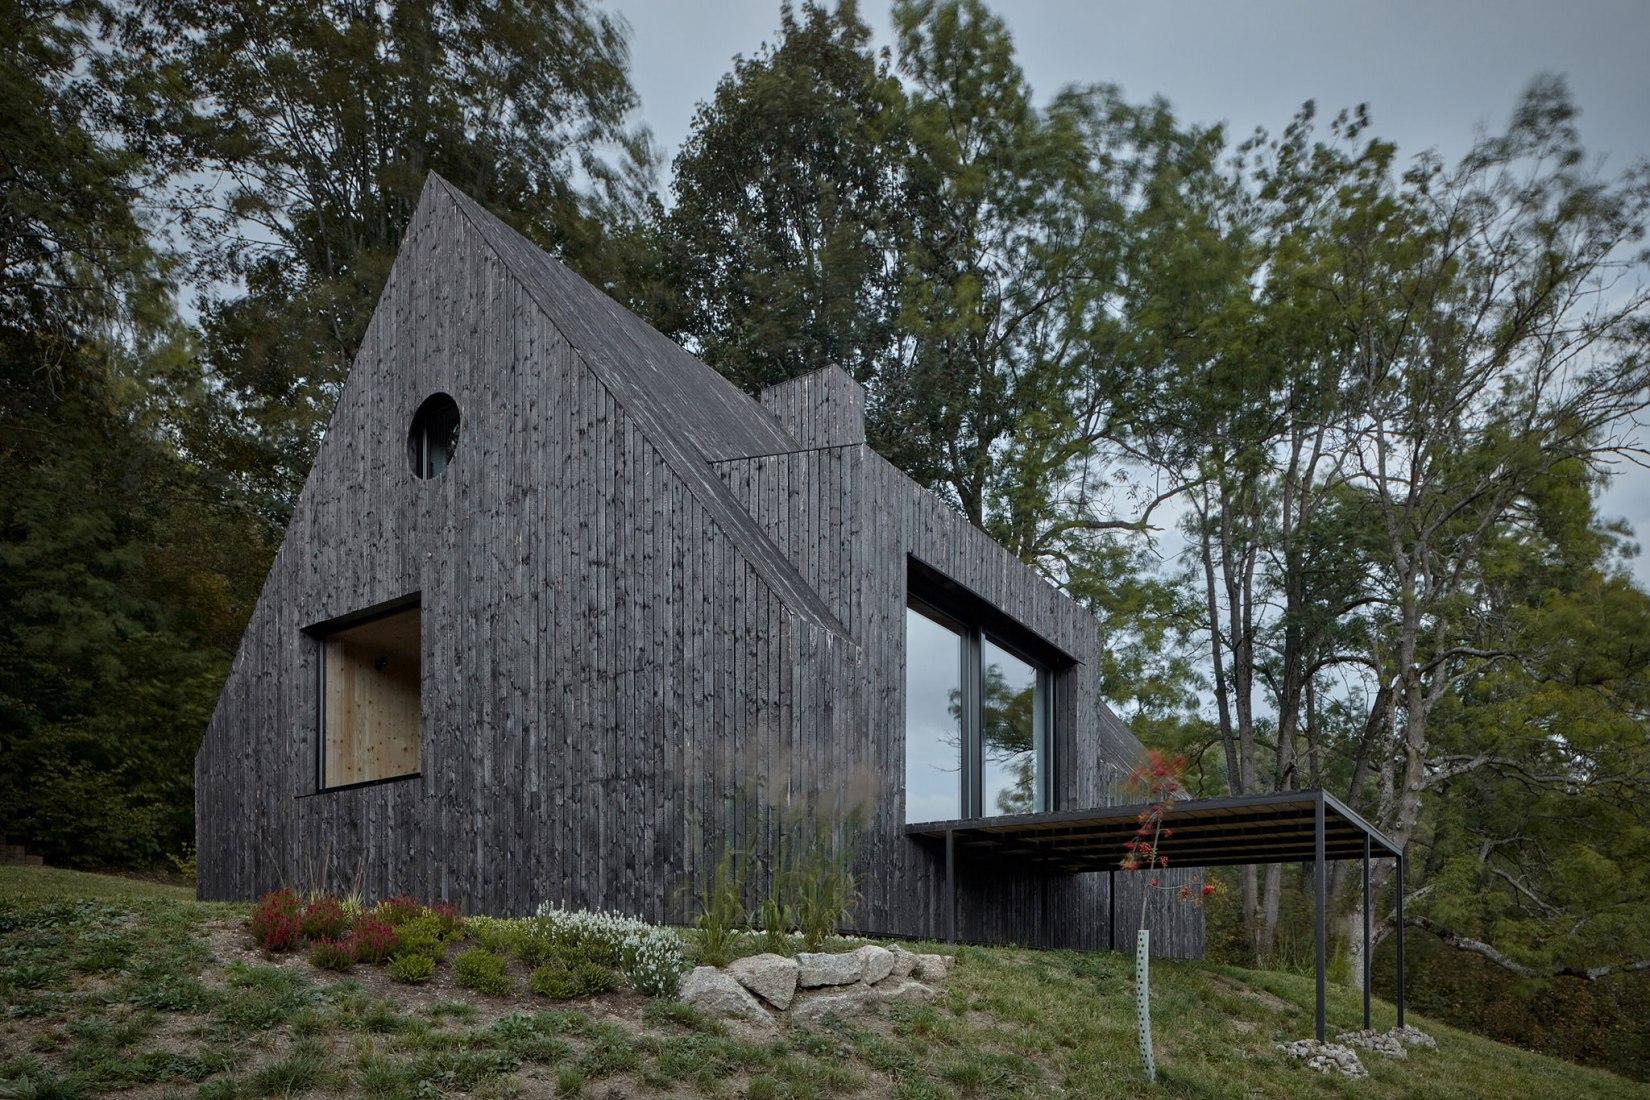 Cottage Pod Bukovou por Mjölk architekti. Fotografía por BoysPlayNice